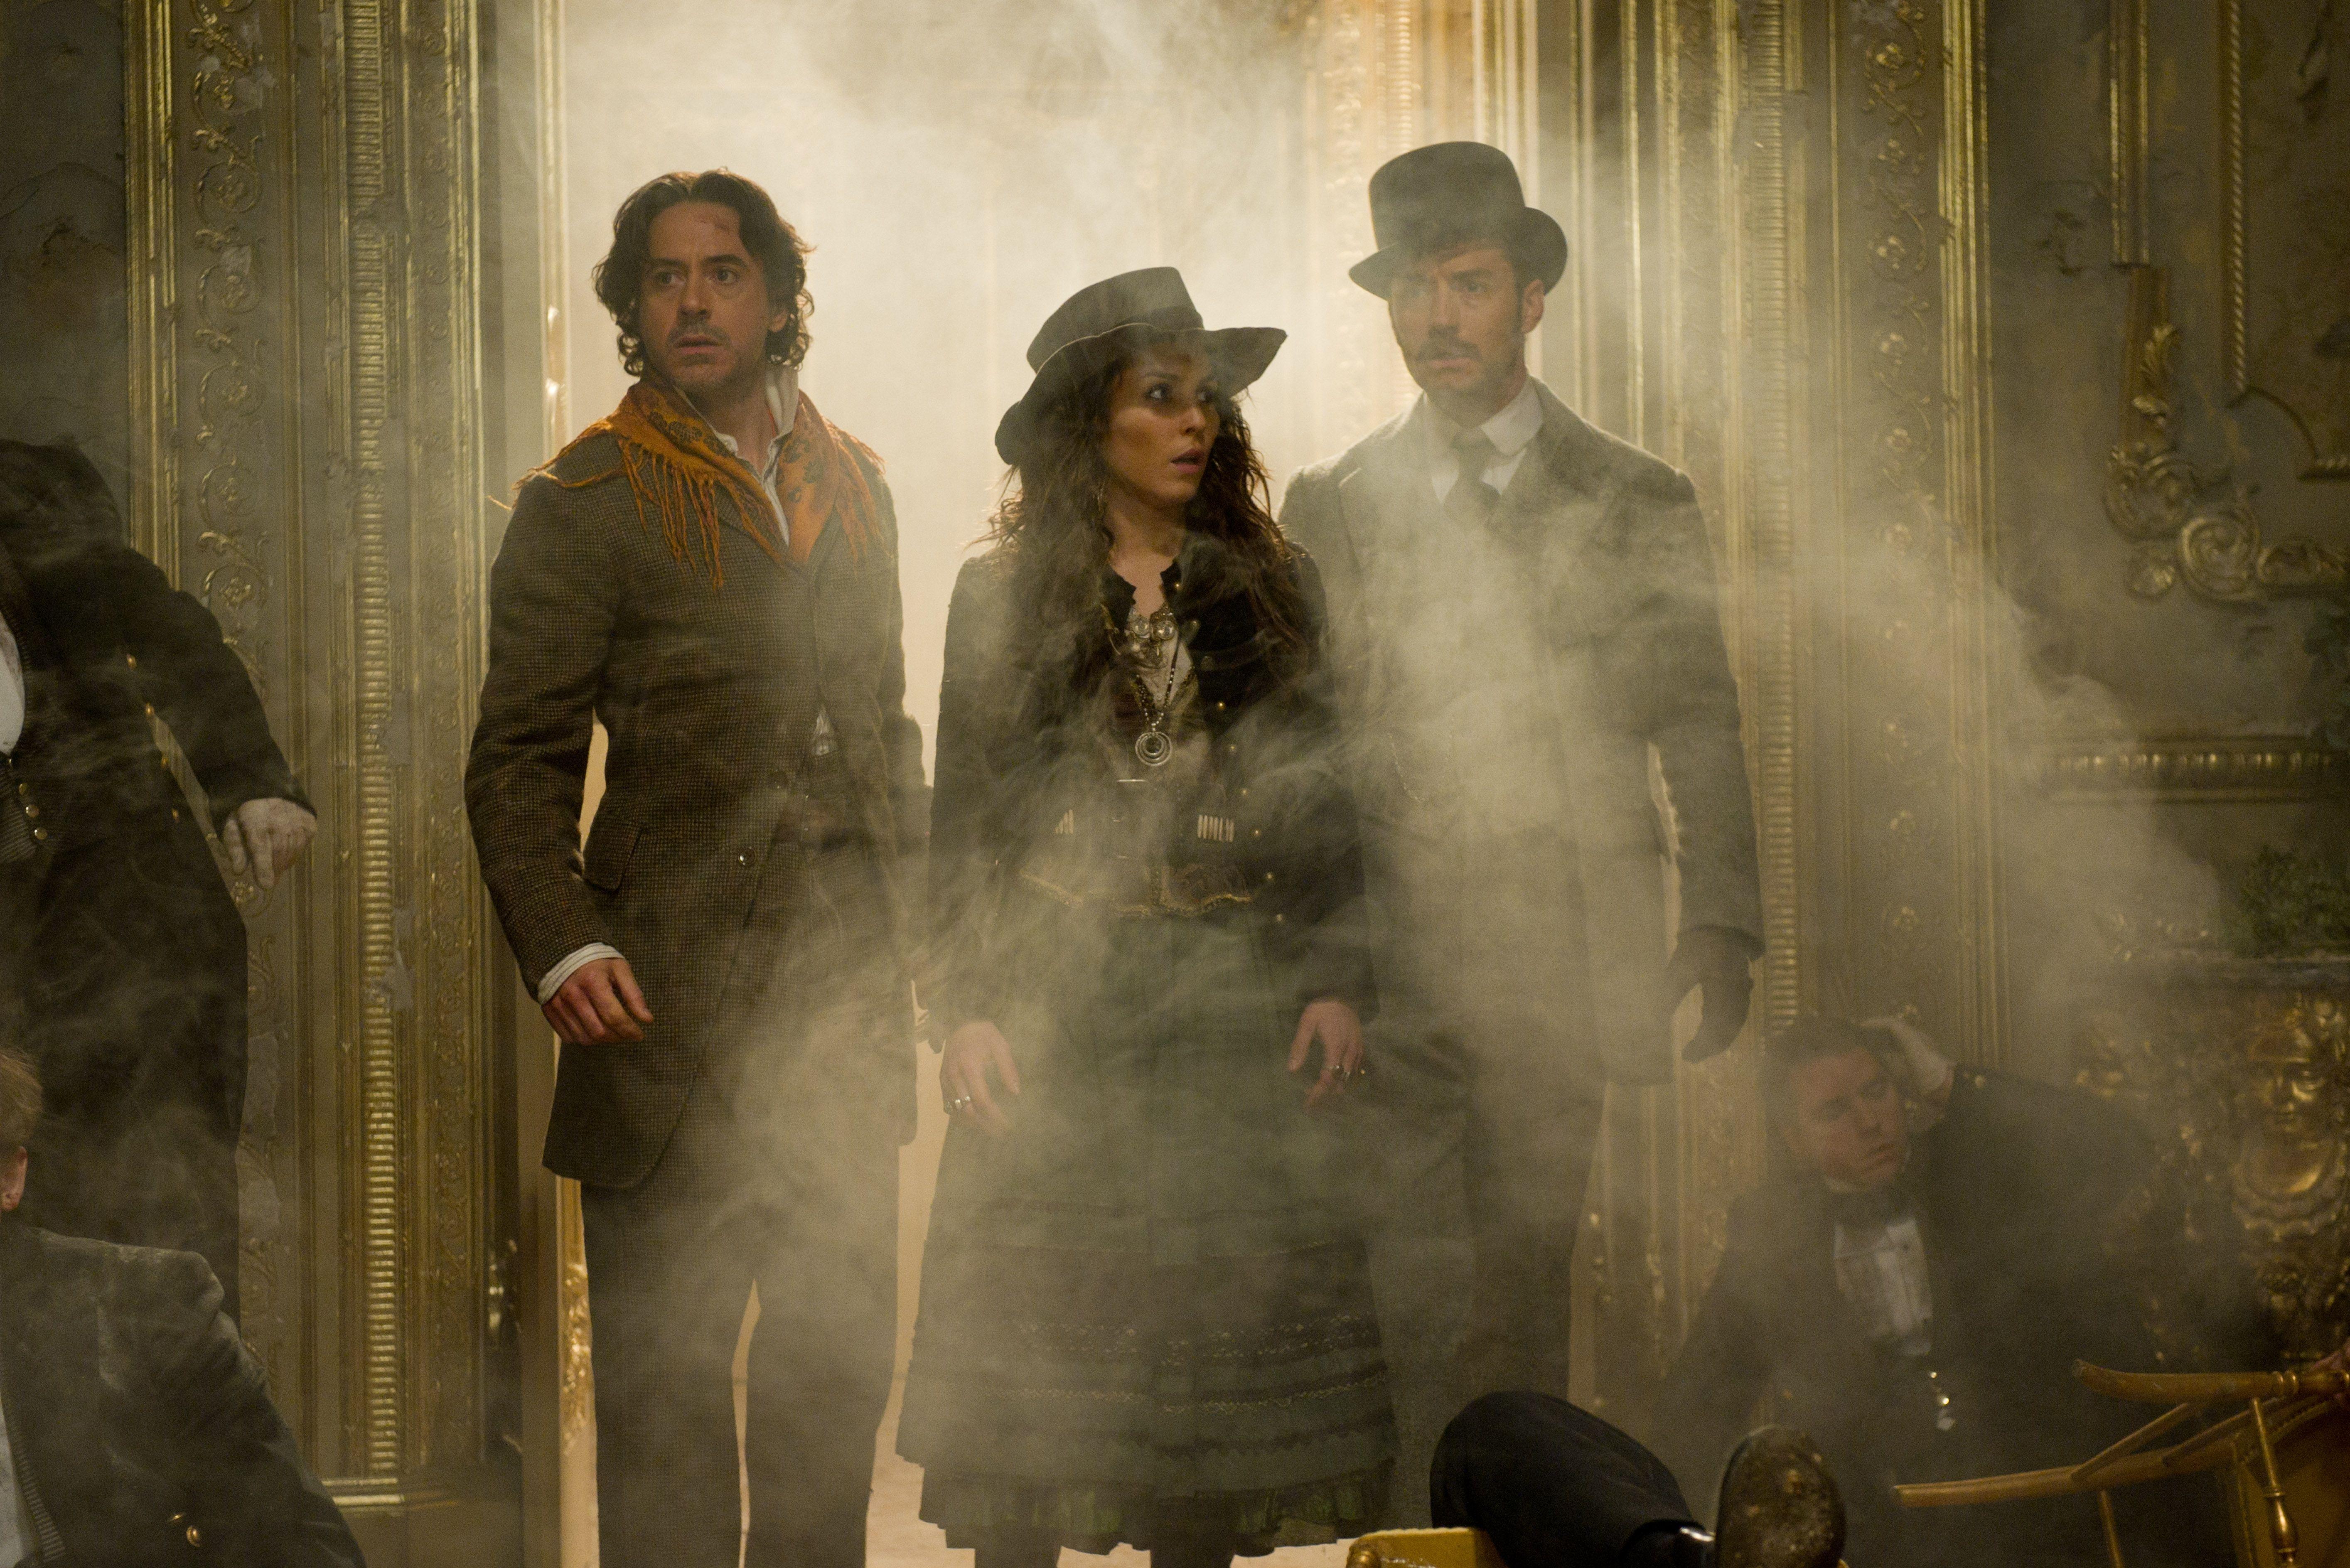 кадры из фильма Шерлок Холмс: Игра теней Роберт Дауни-мл., Номи Рапас, Джуд Лоу,